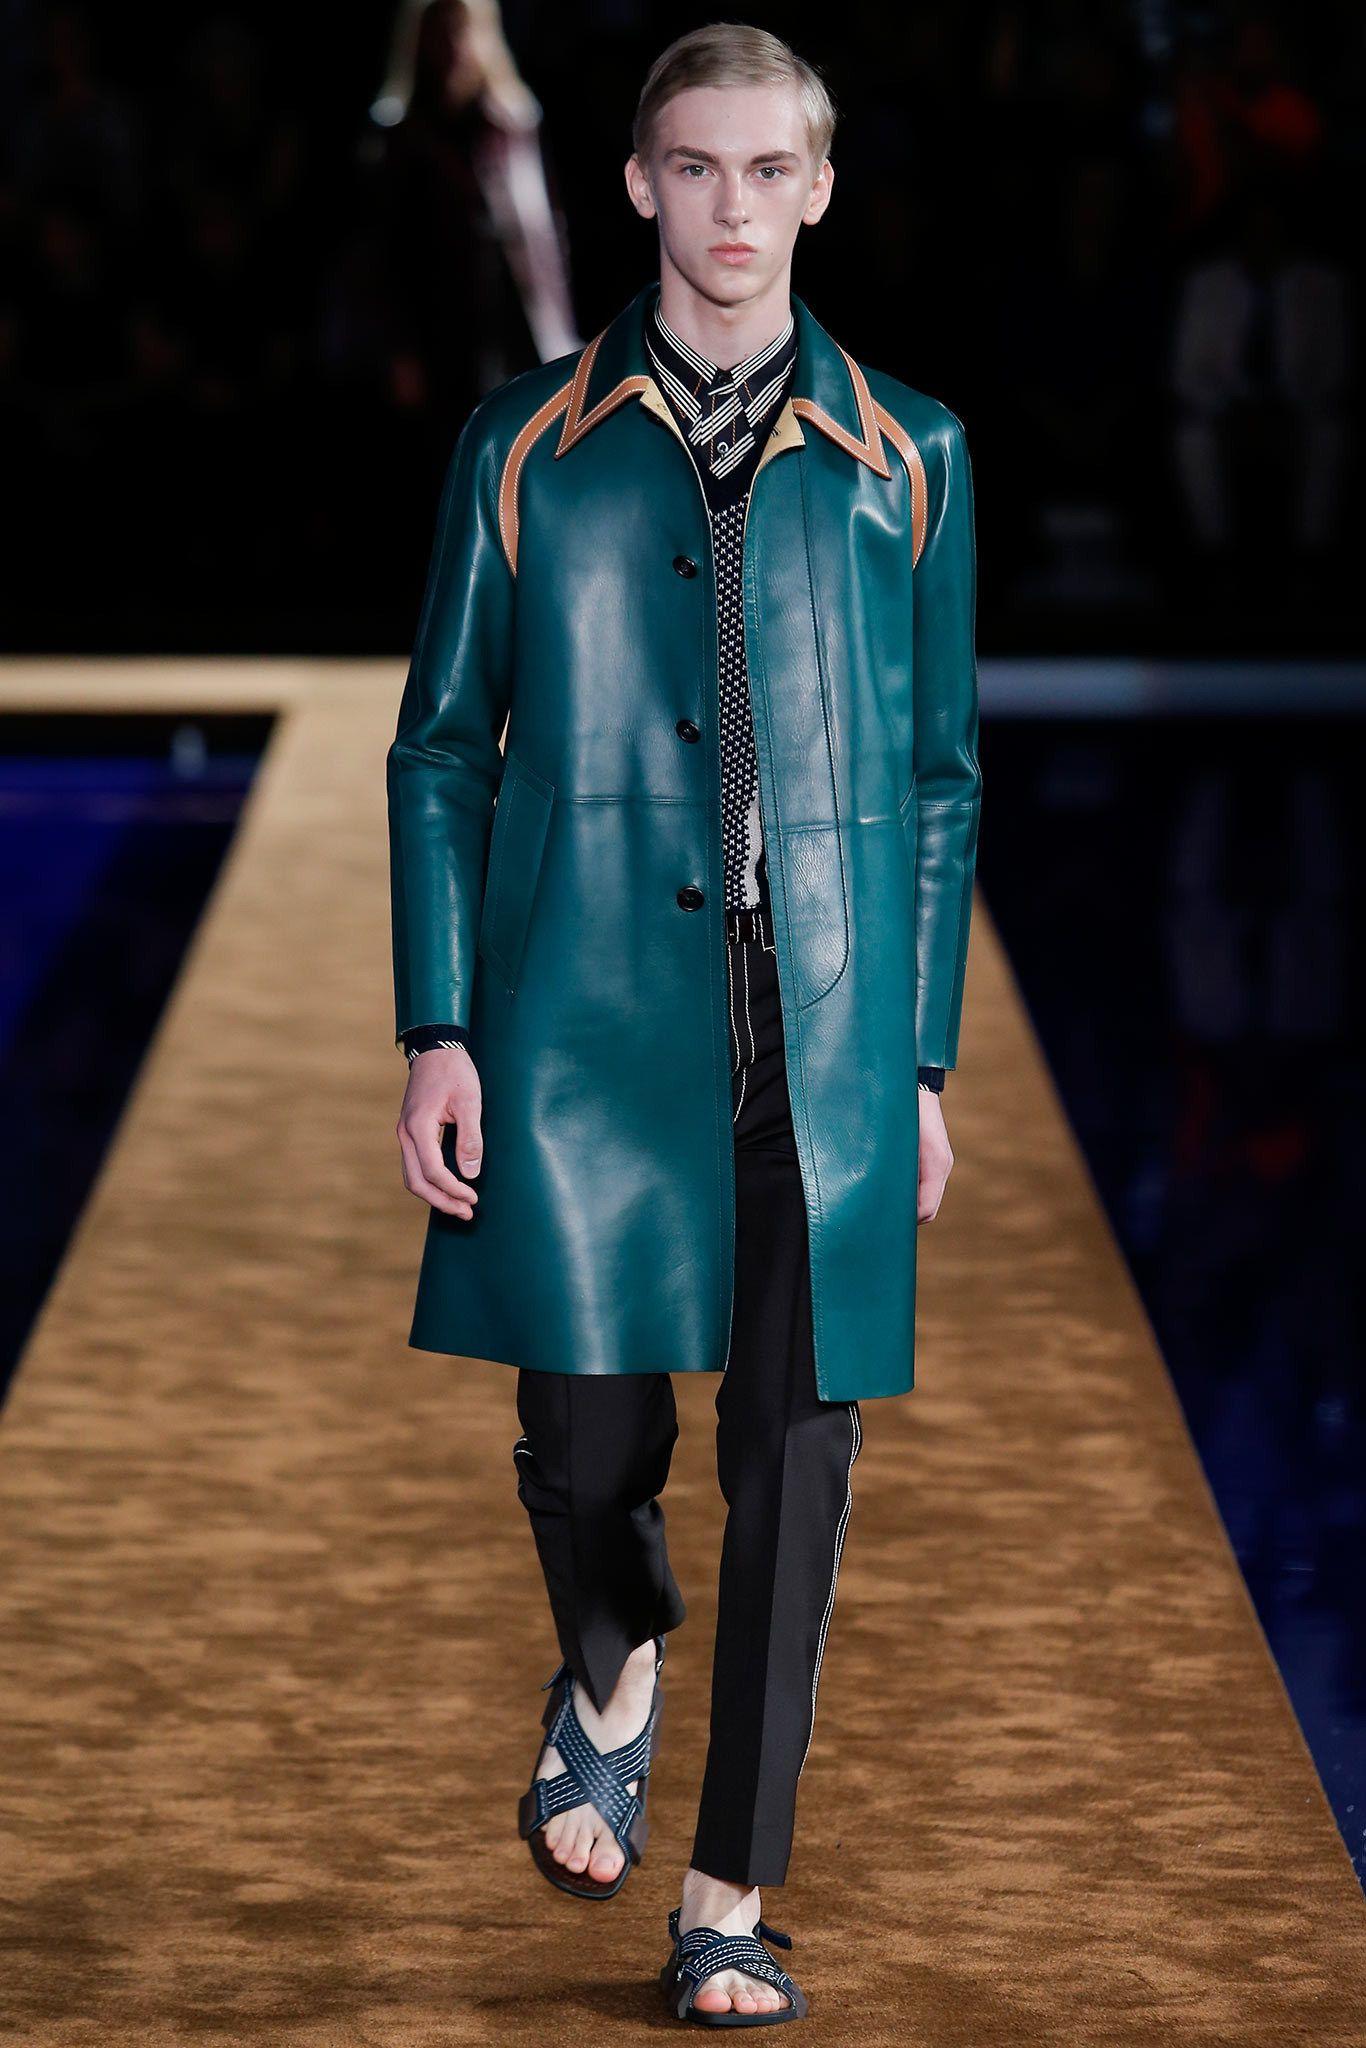 Prada Spring 2015 Menswear Fashion Show - Dominik Sadoch